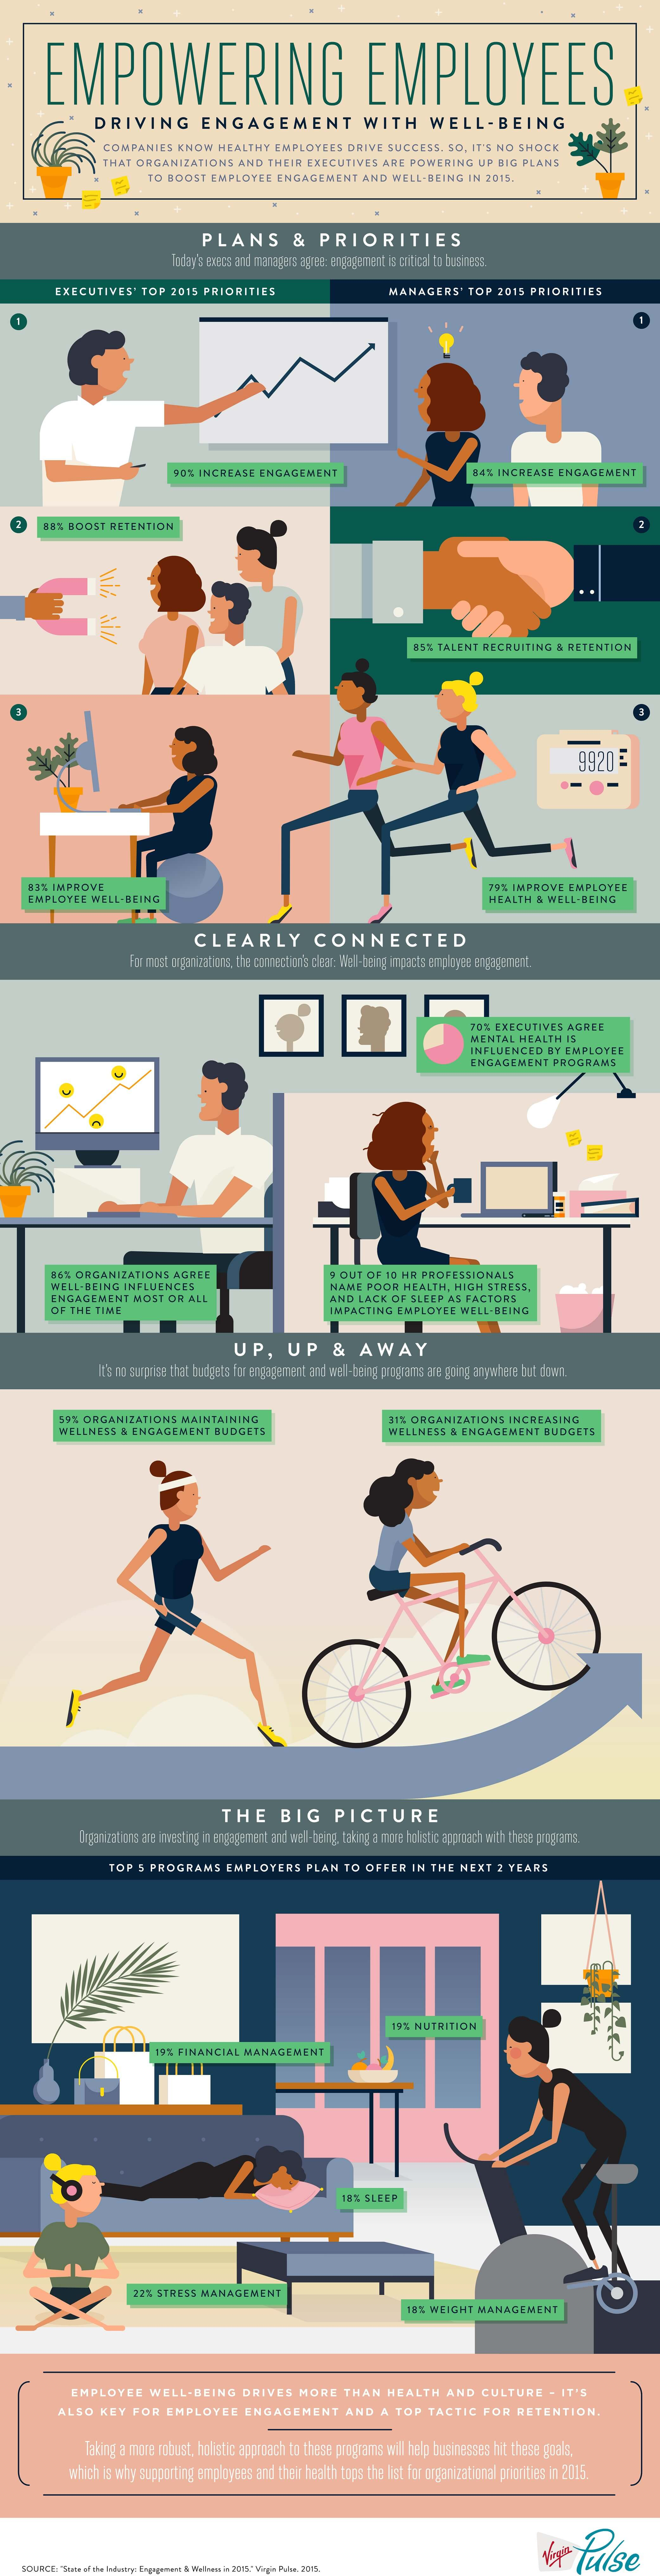 Improve-employee-engagement-infographic